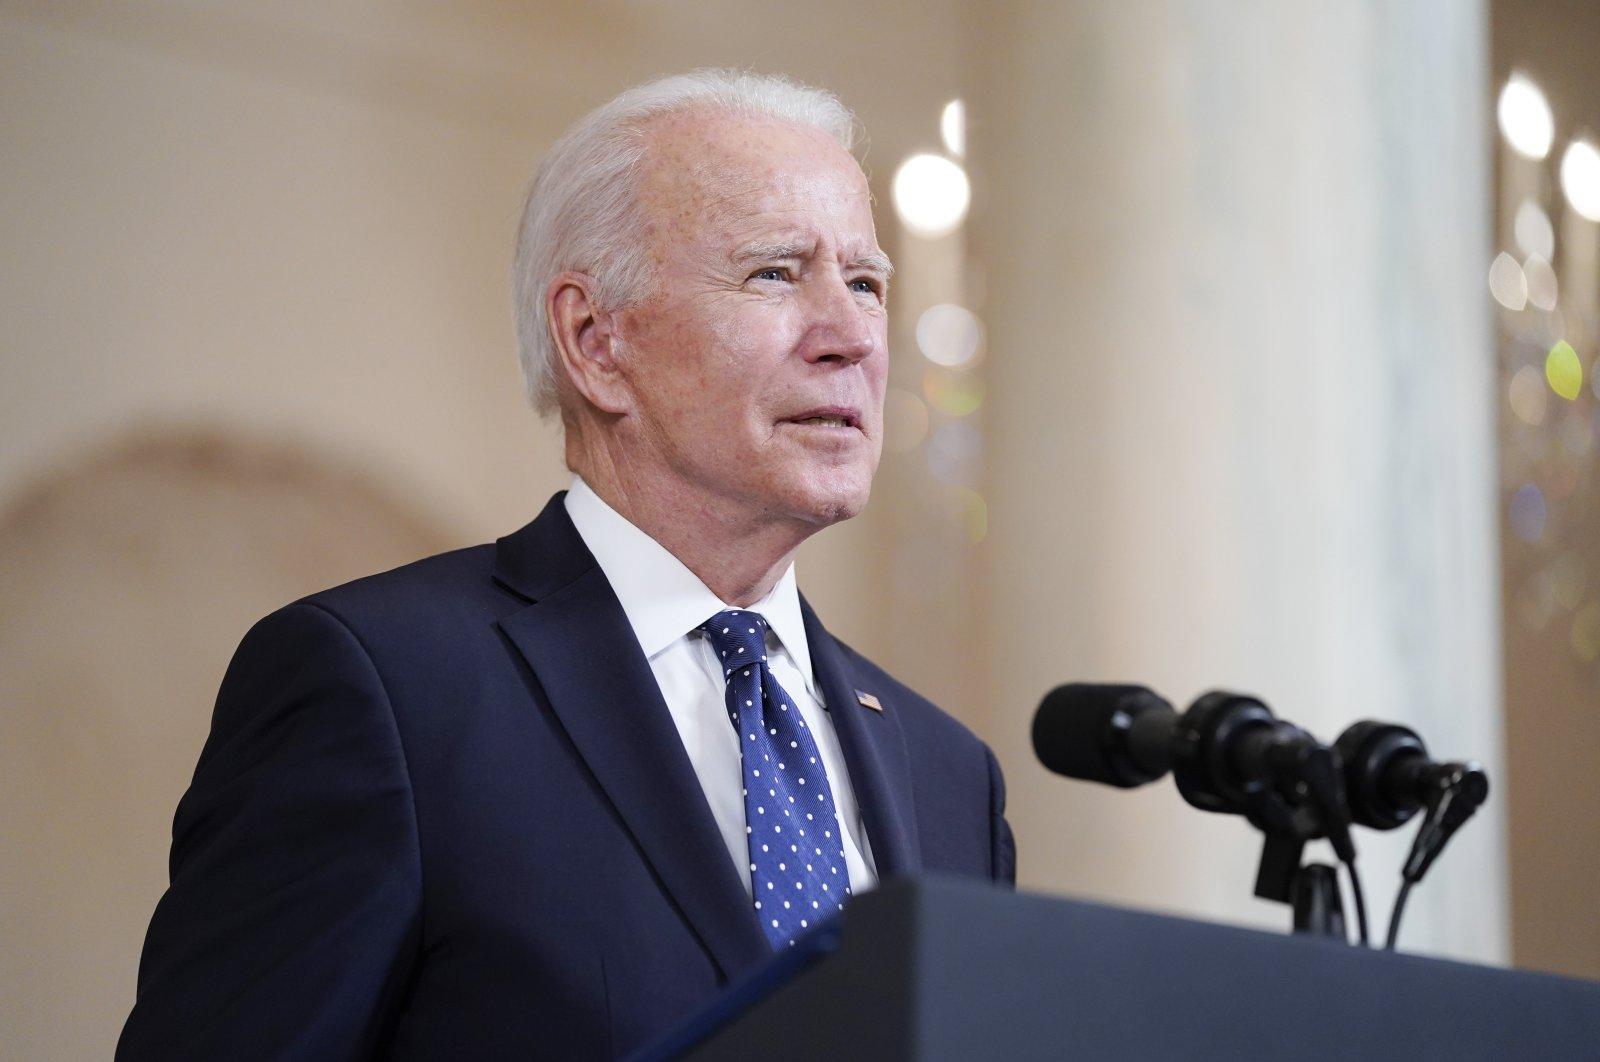 President Joe Biden speaks Tuesday, April 20, 2021, at the White House in Washington, D.C., U.S., April 20, 2021. (AP Photo)